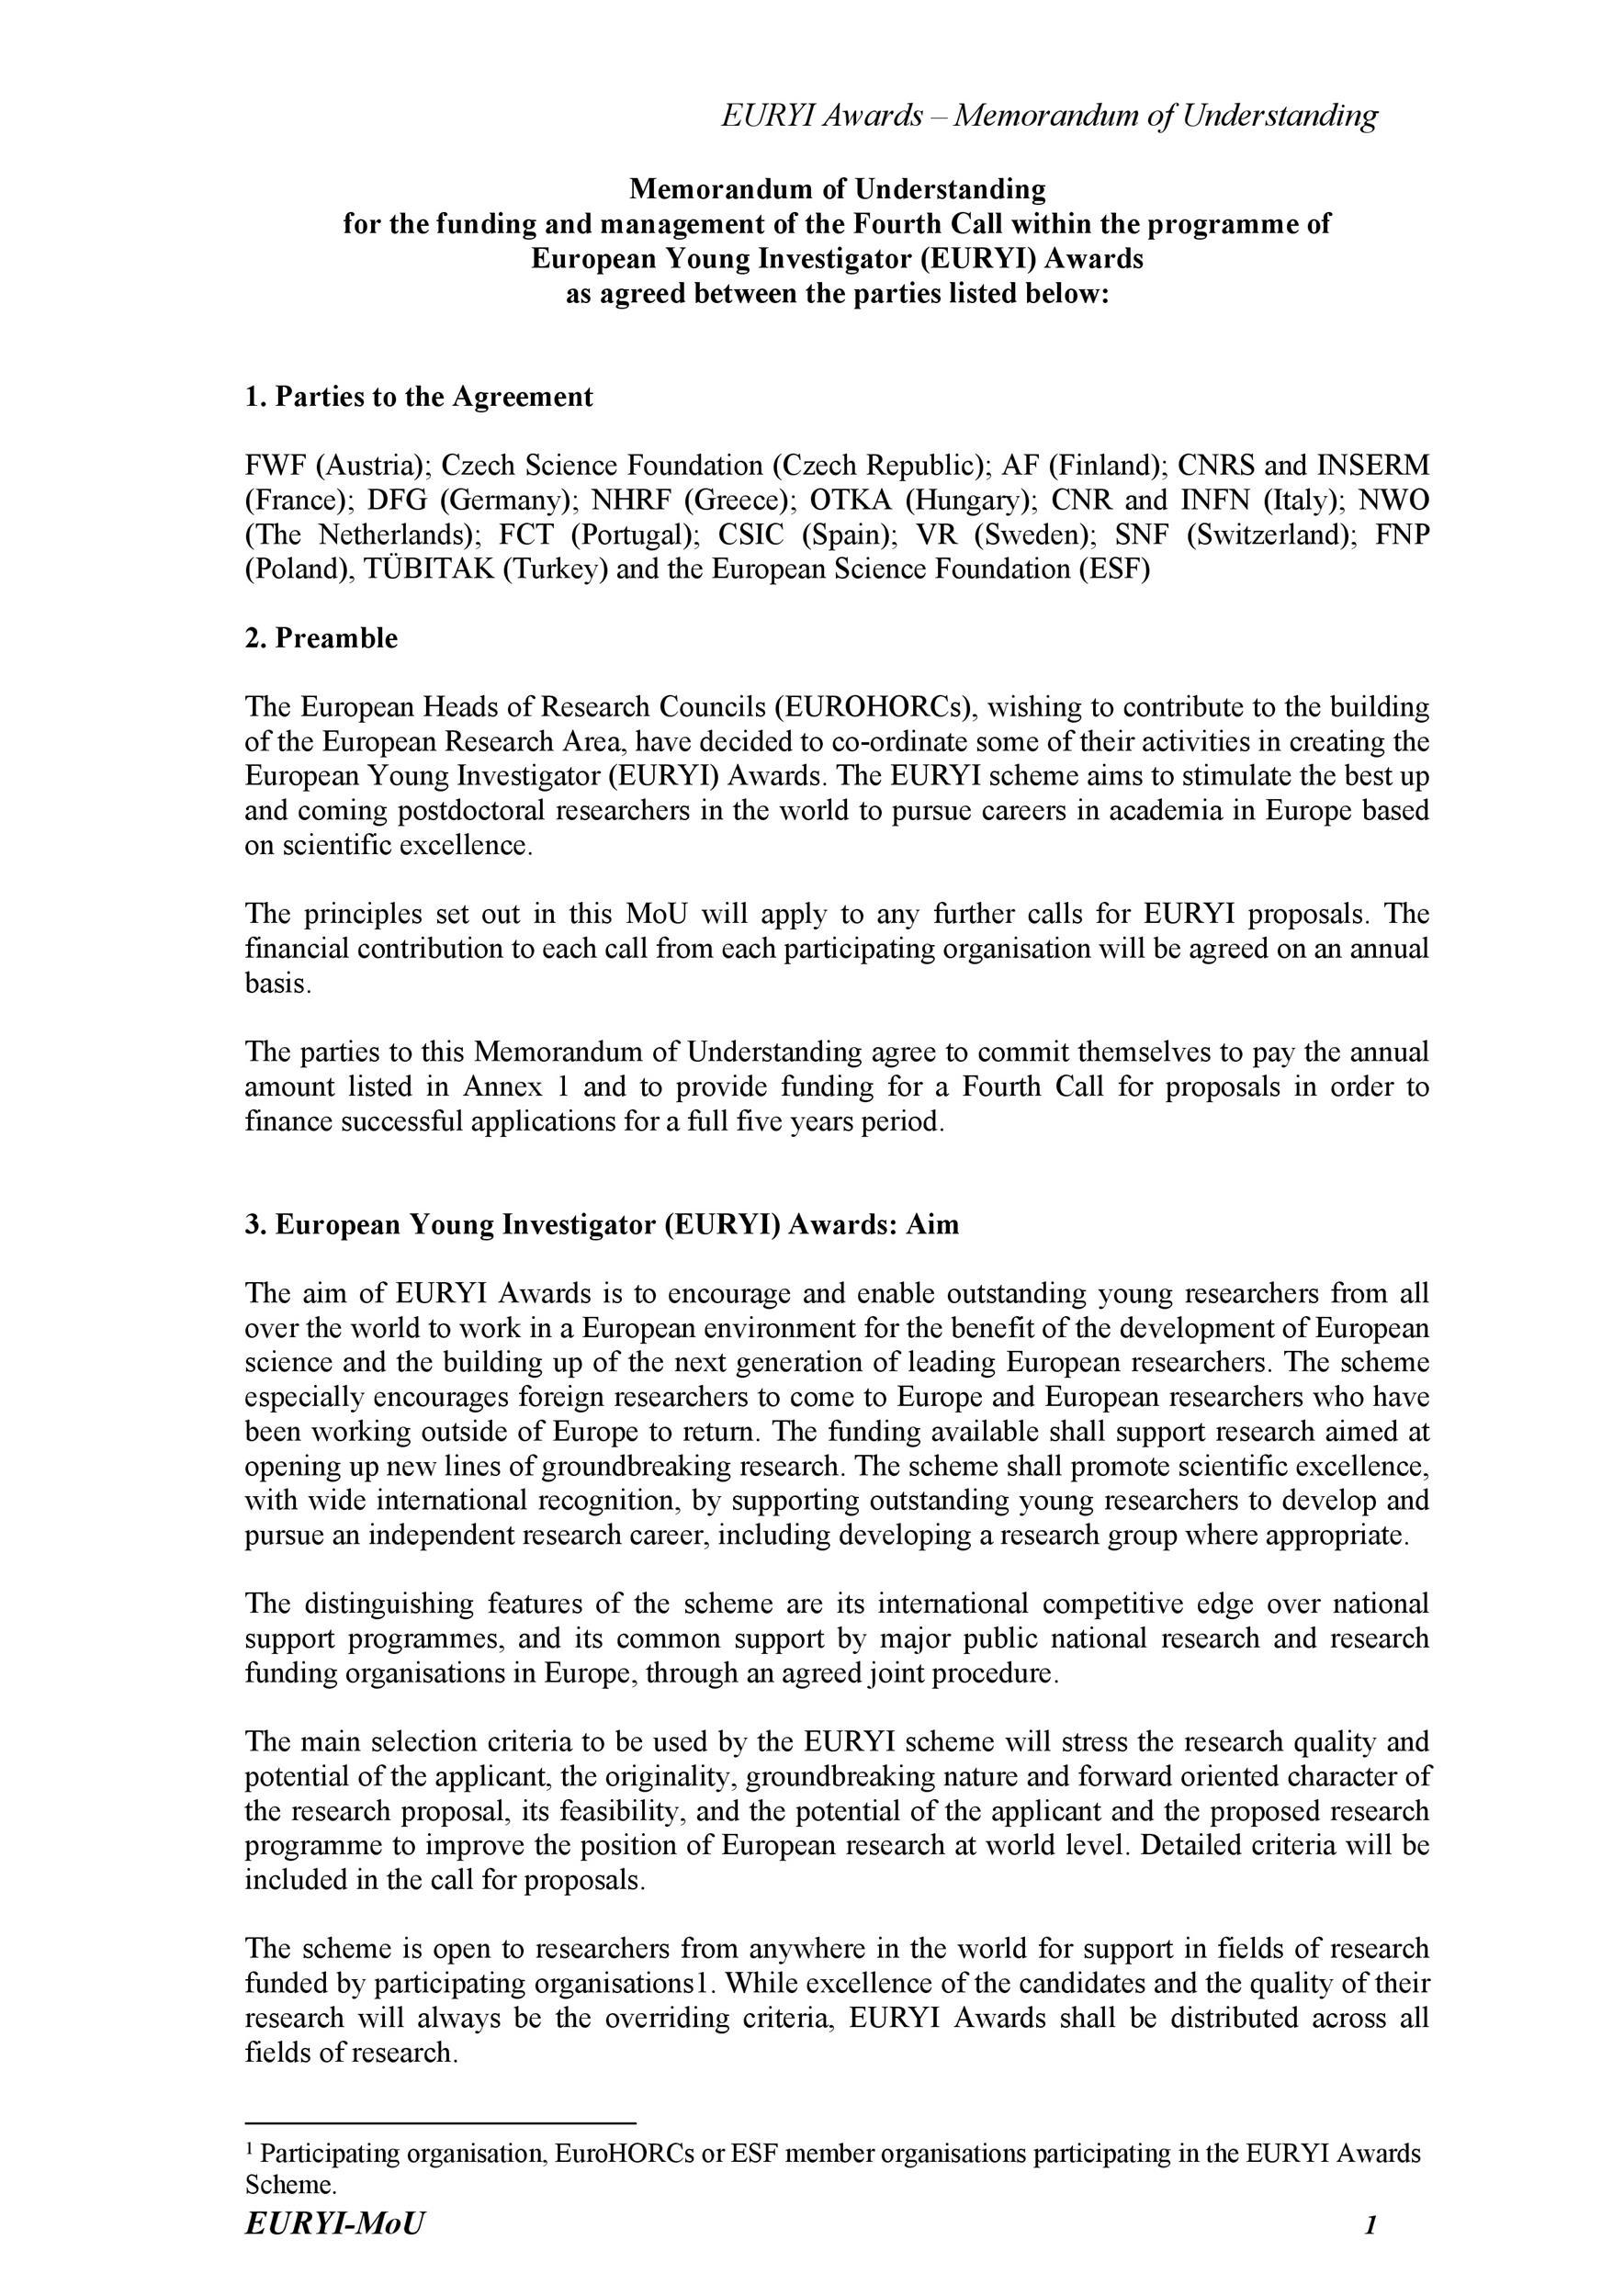 free sample of memorandum of understanding